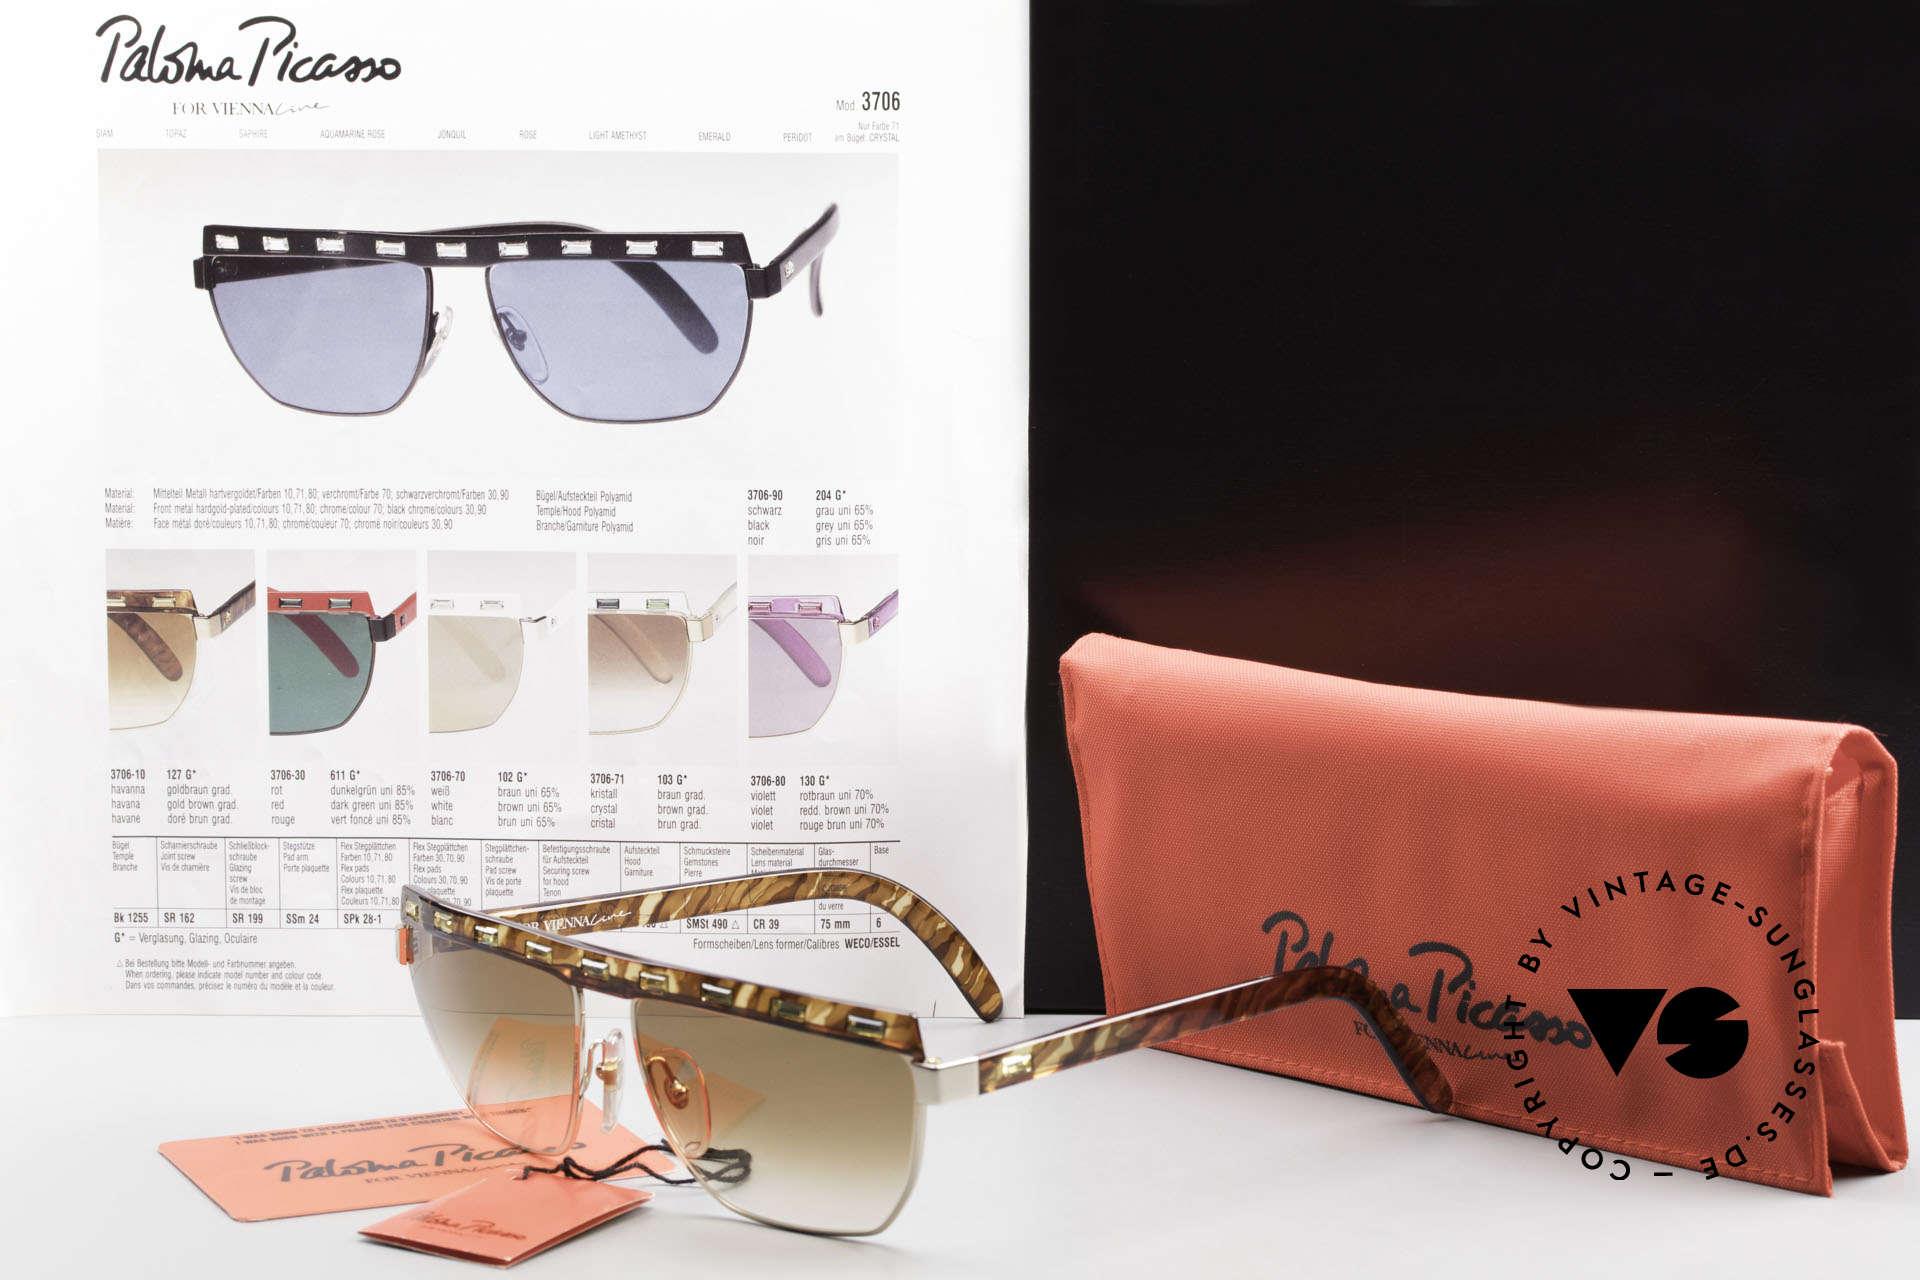 Paloma Picasso 3706 Ladies Gem Sunglasses 90's, Size: medium, Made for Women